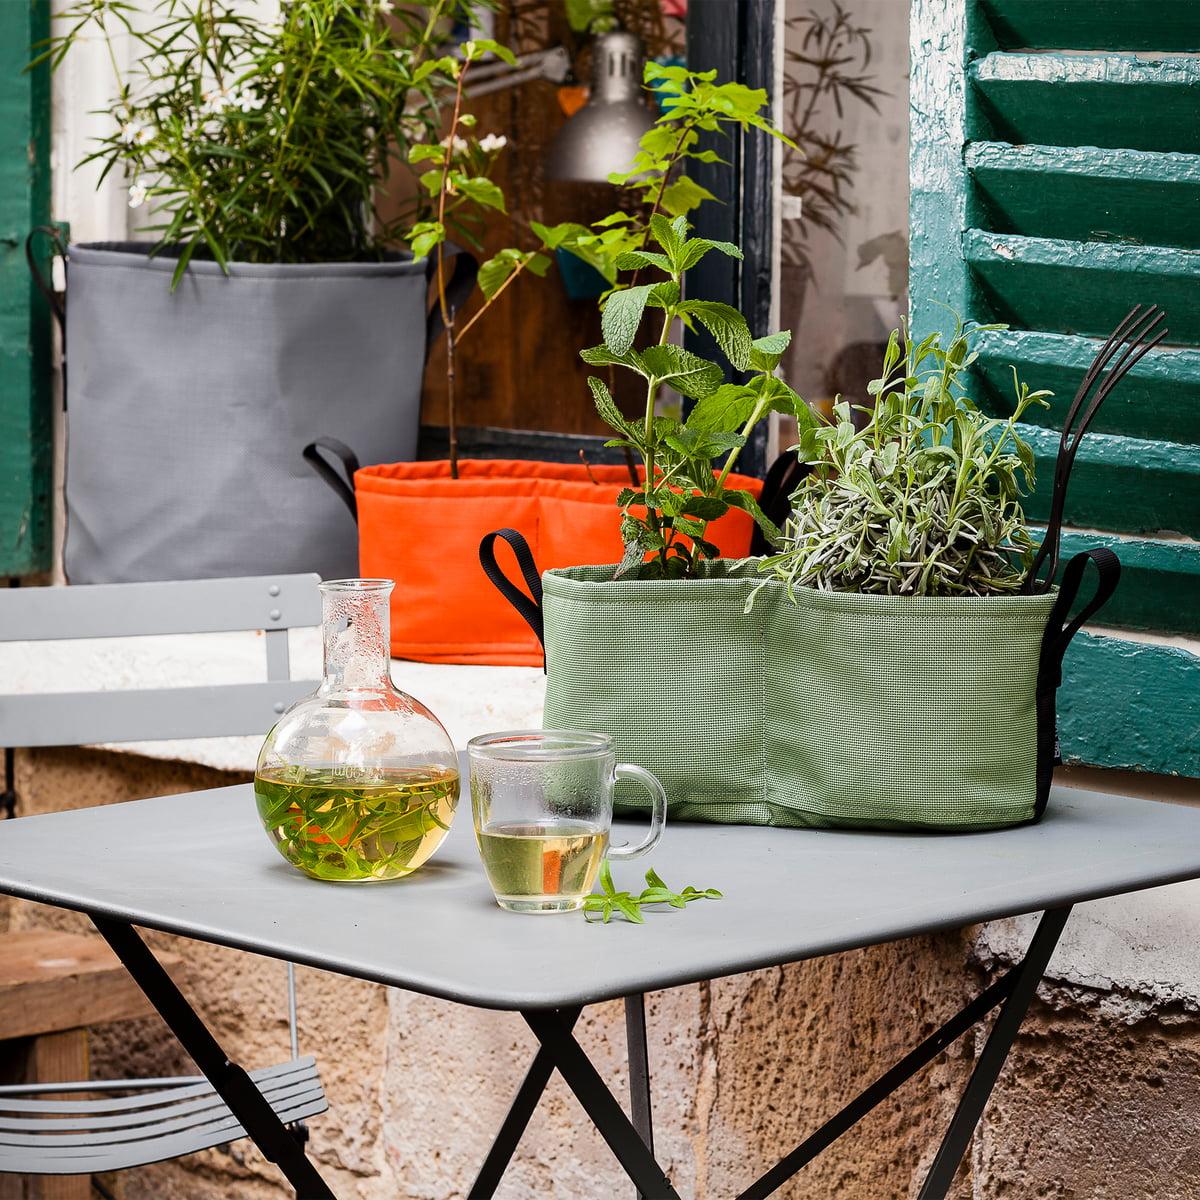 BACSAC - Hanging Window Box Pflanztasche 3 Batyline 25 l| yucca | Garten > Pflanzen > Pflanzen | Bacsac